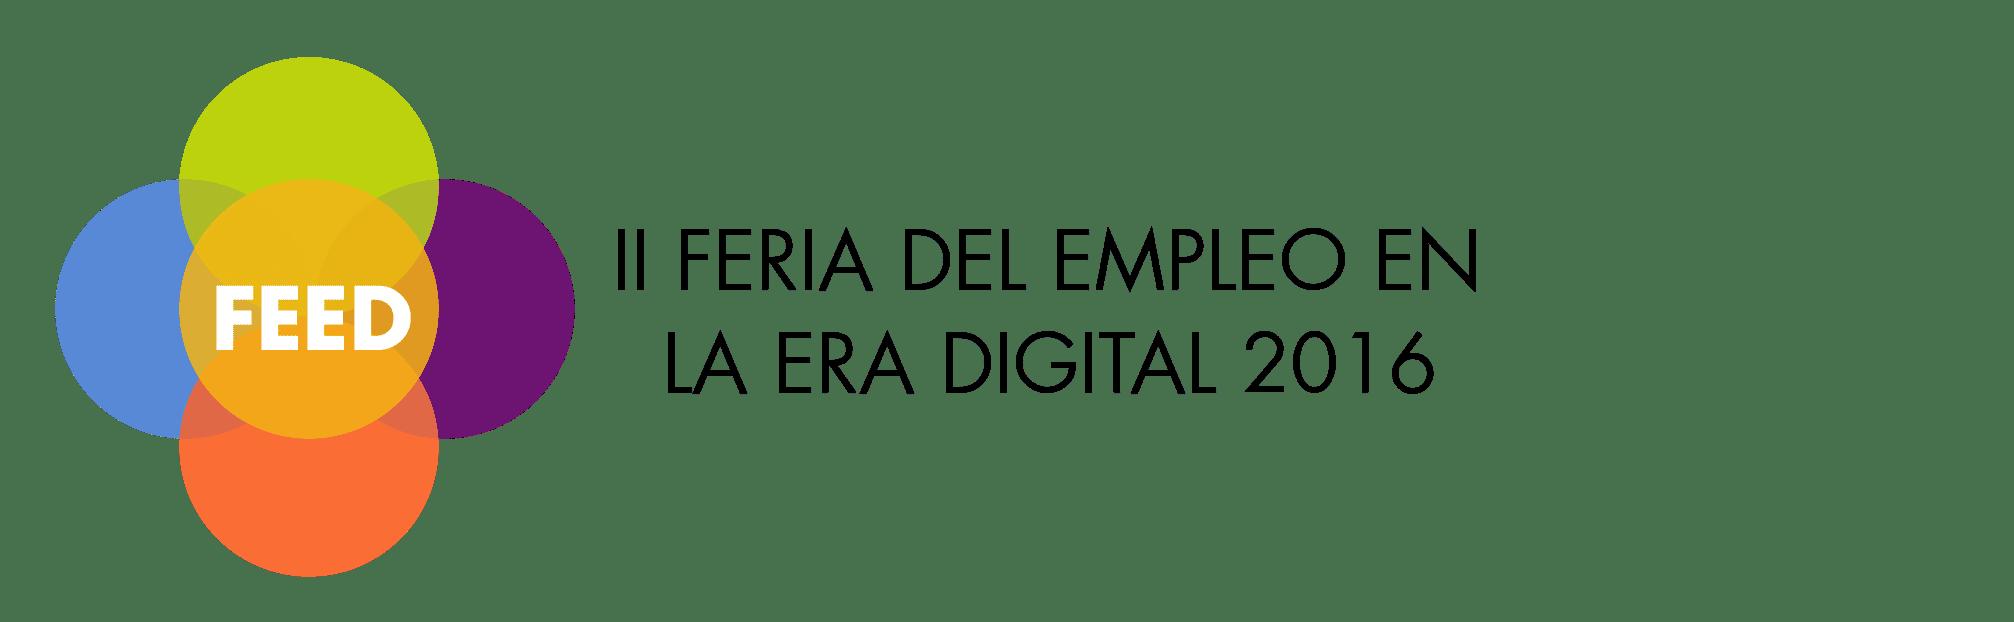 logo feria del empleo en la era digital formato 2016